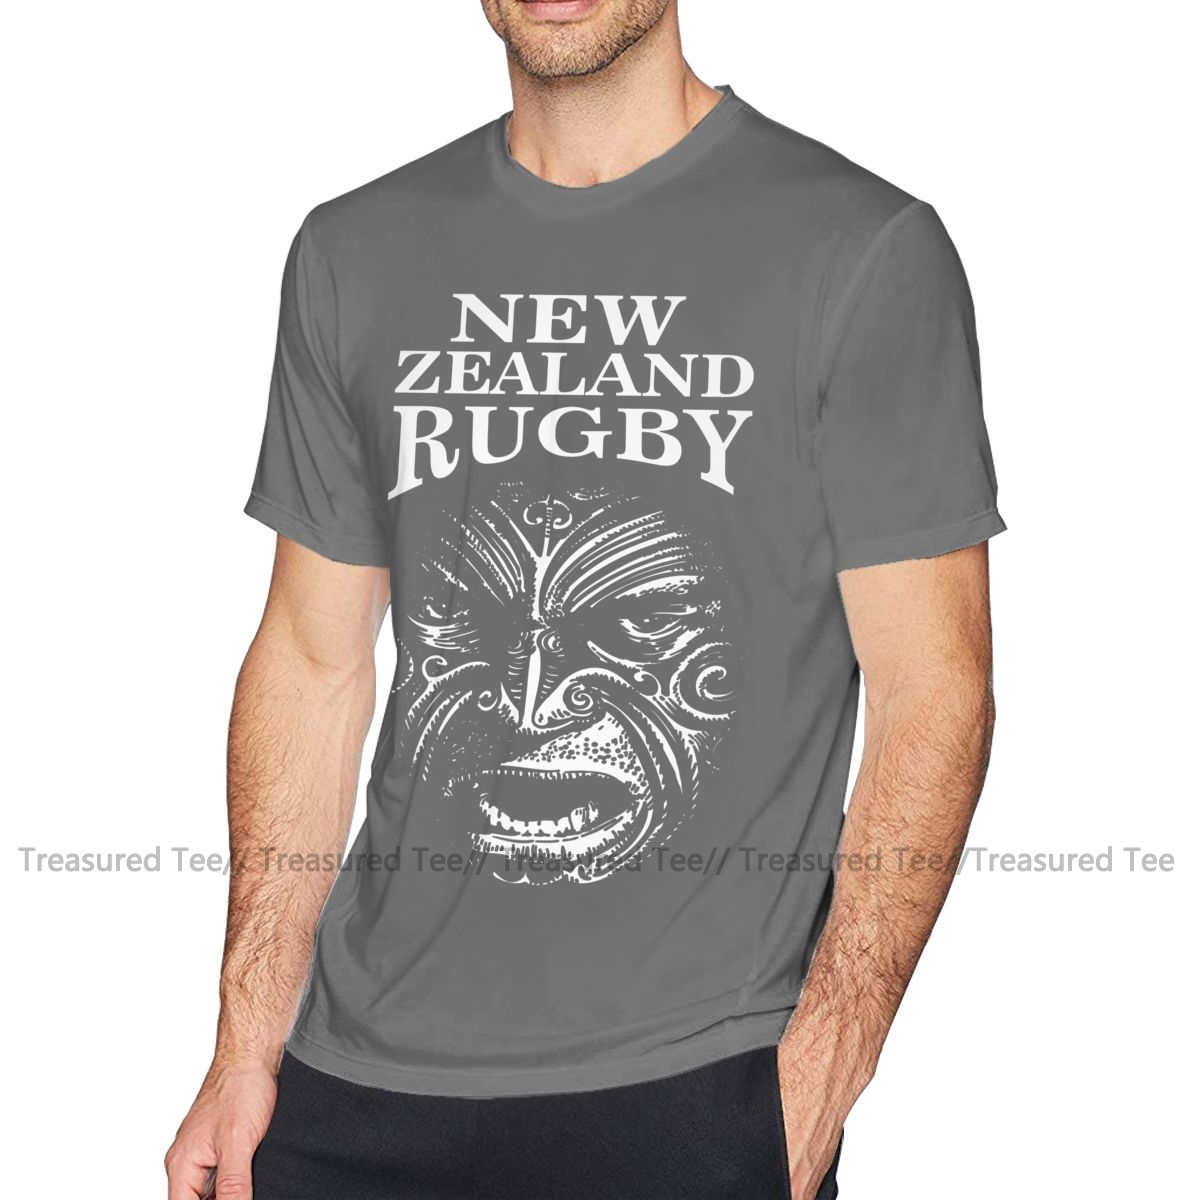 5XL T Shirt All Union Size 4XL New Zealand Fern Rugby T-Shirt Kiwi Blacks